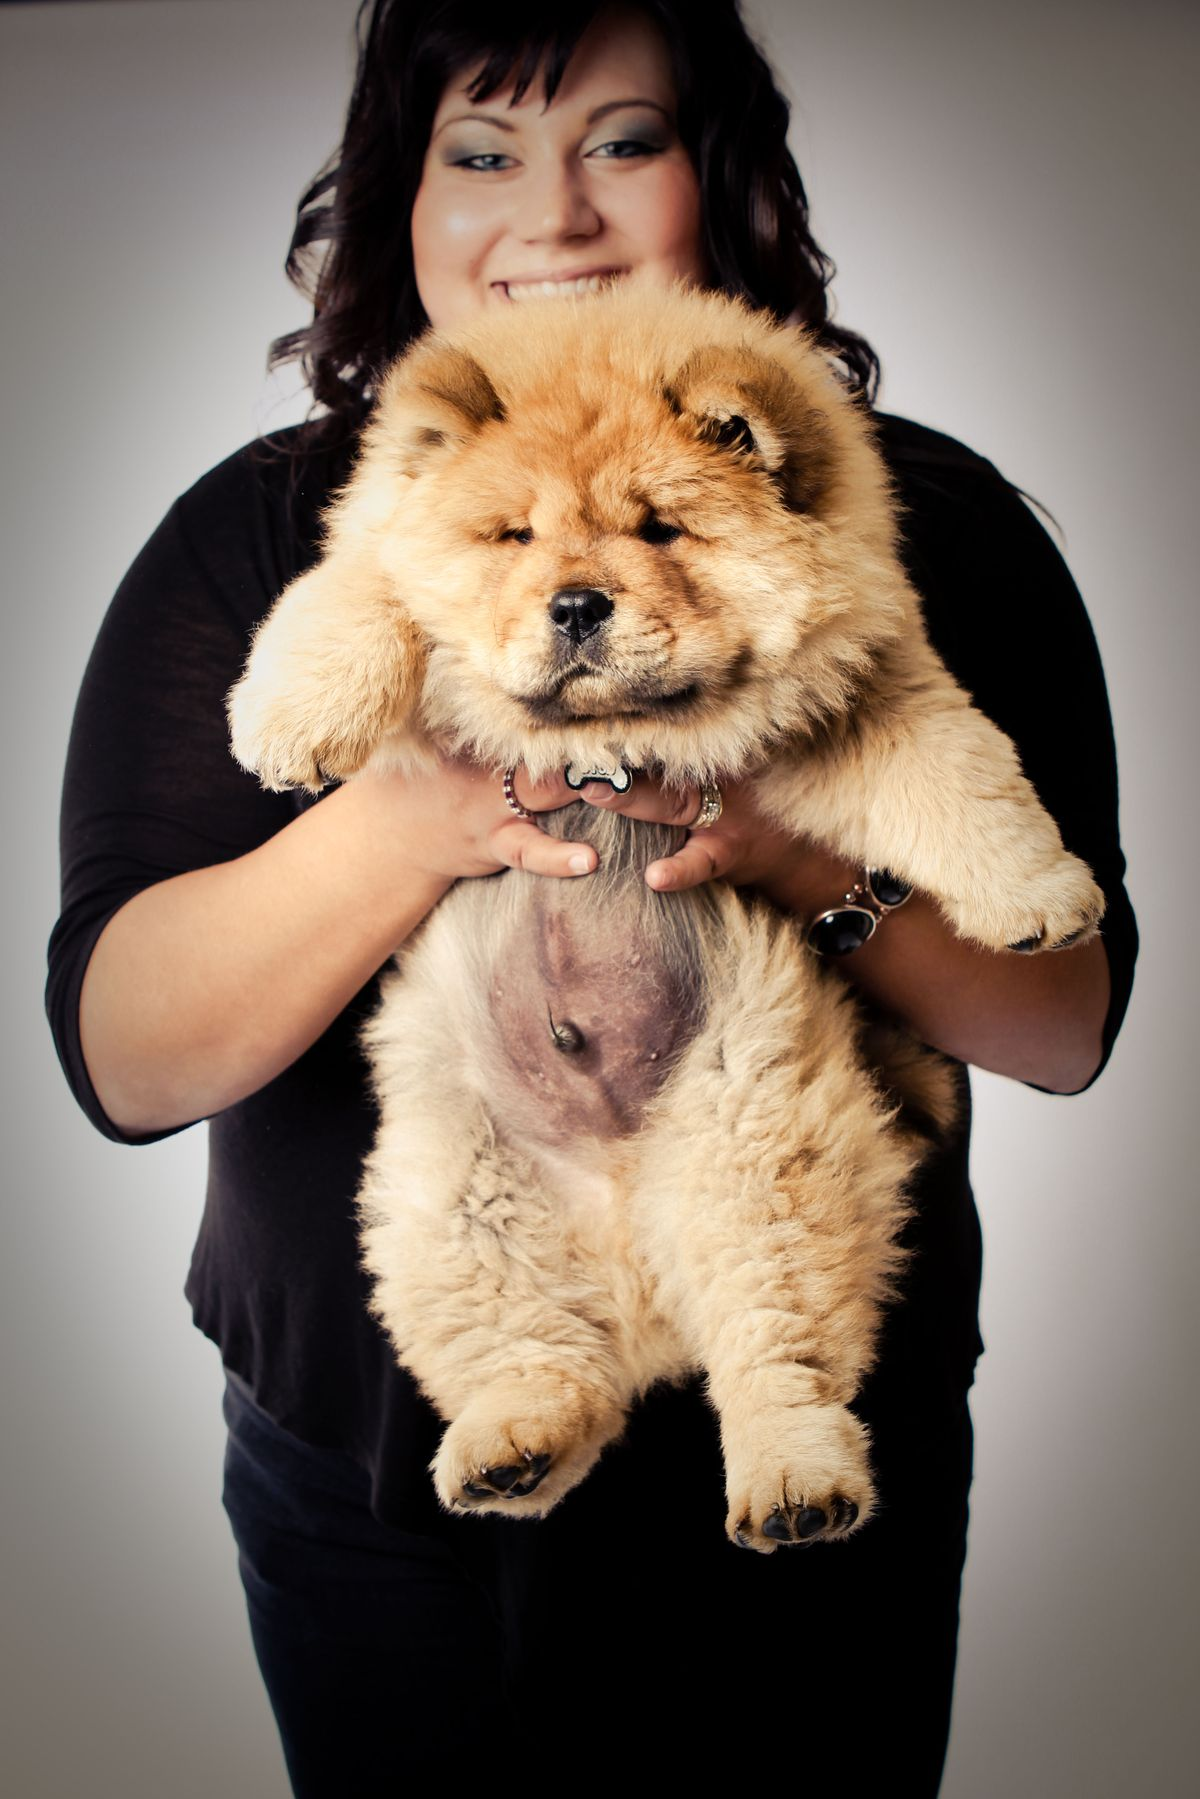 23 Chubby Puppies Mistaken For Teddy Bears  Earth Porm